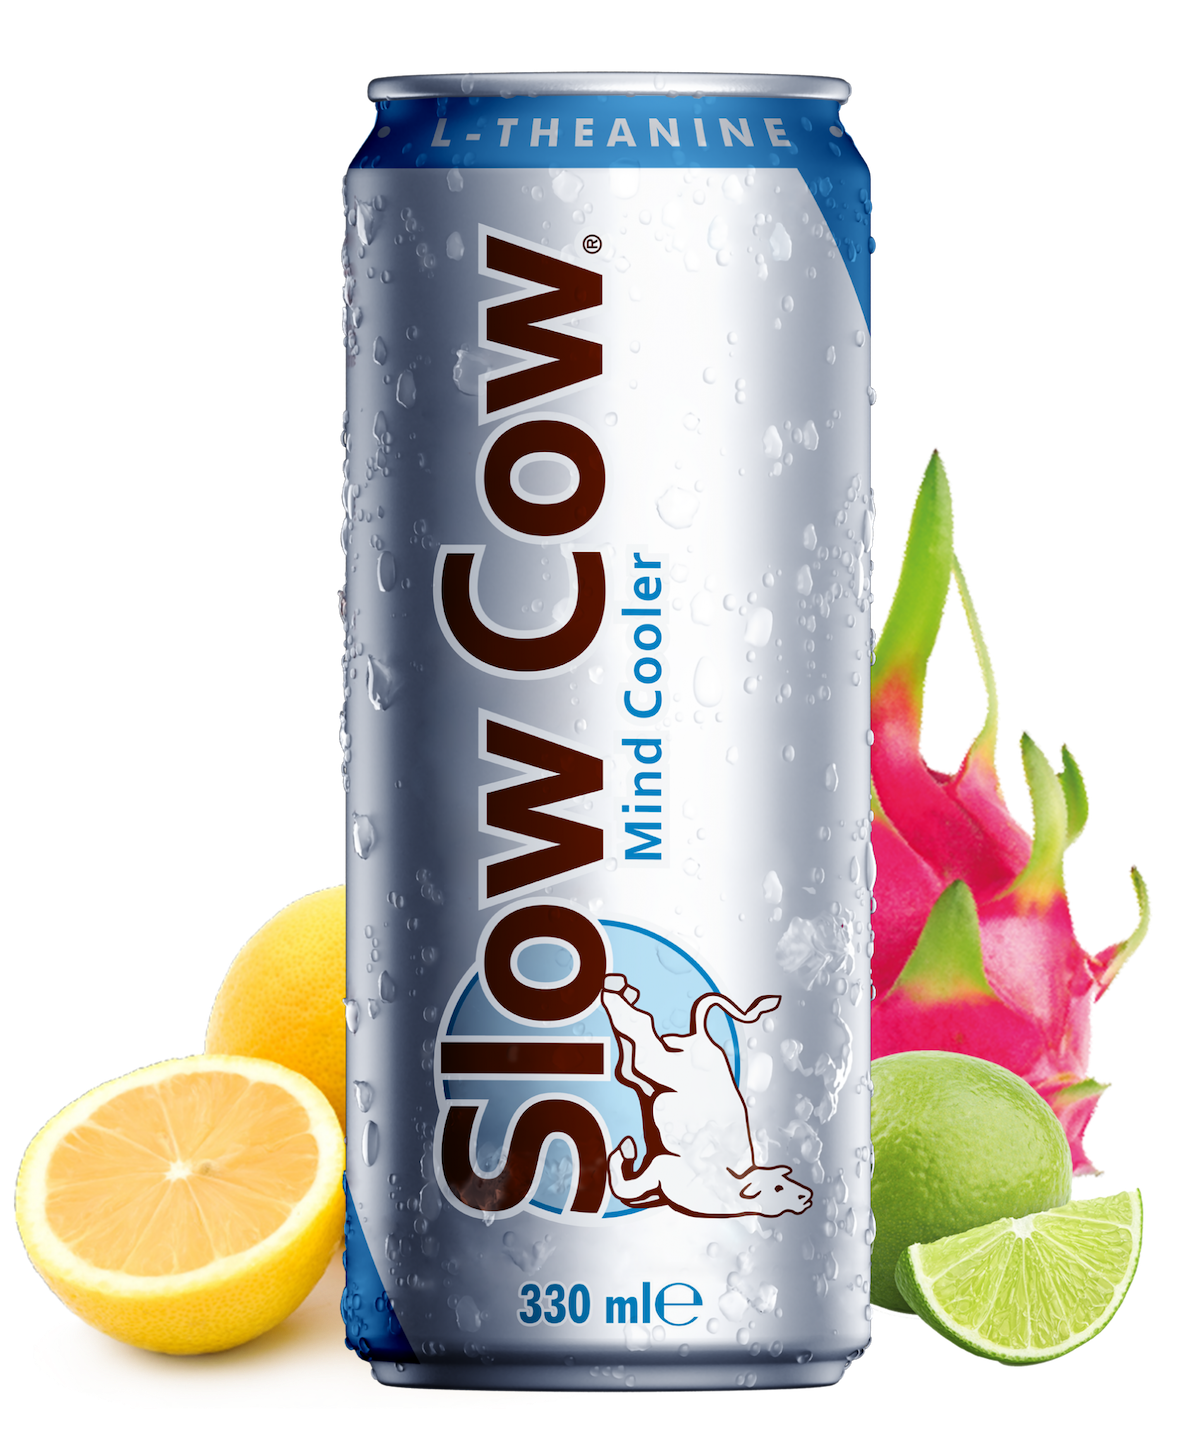 slow cow anti-energy drink